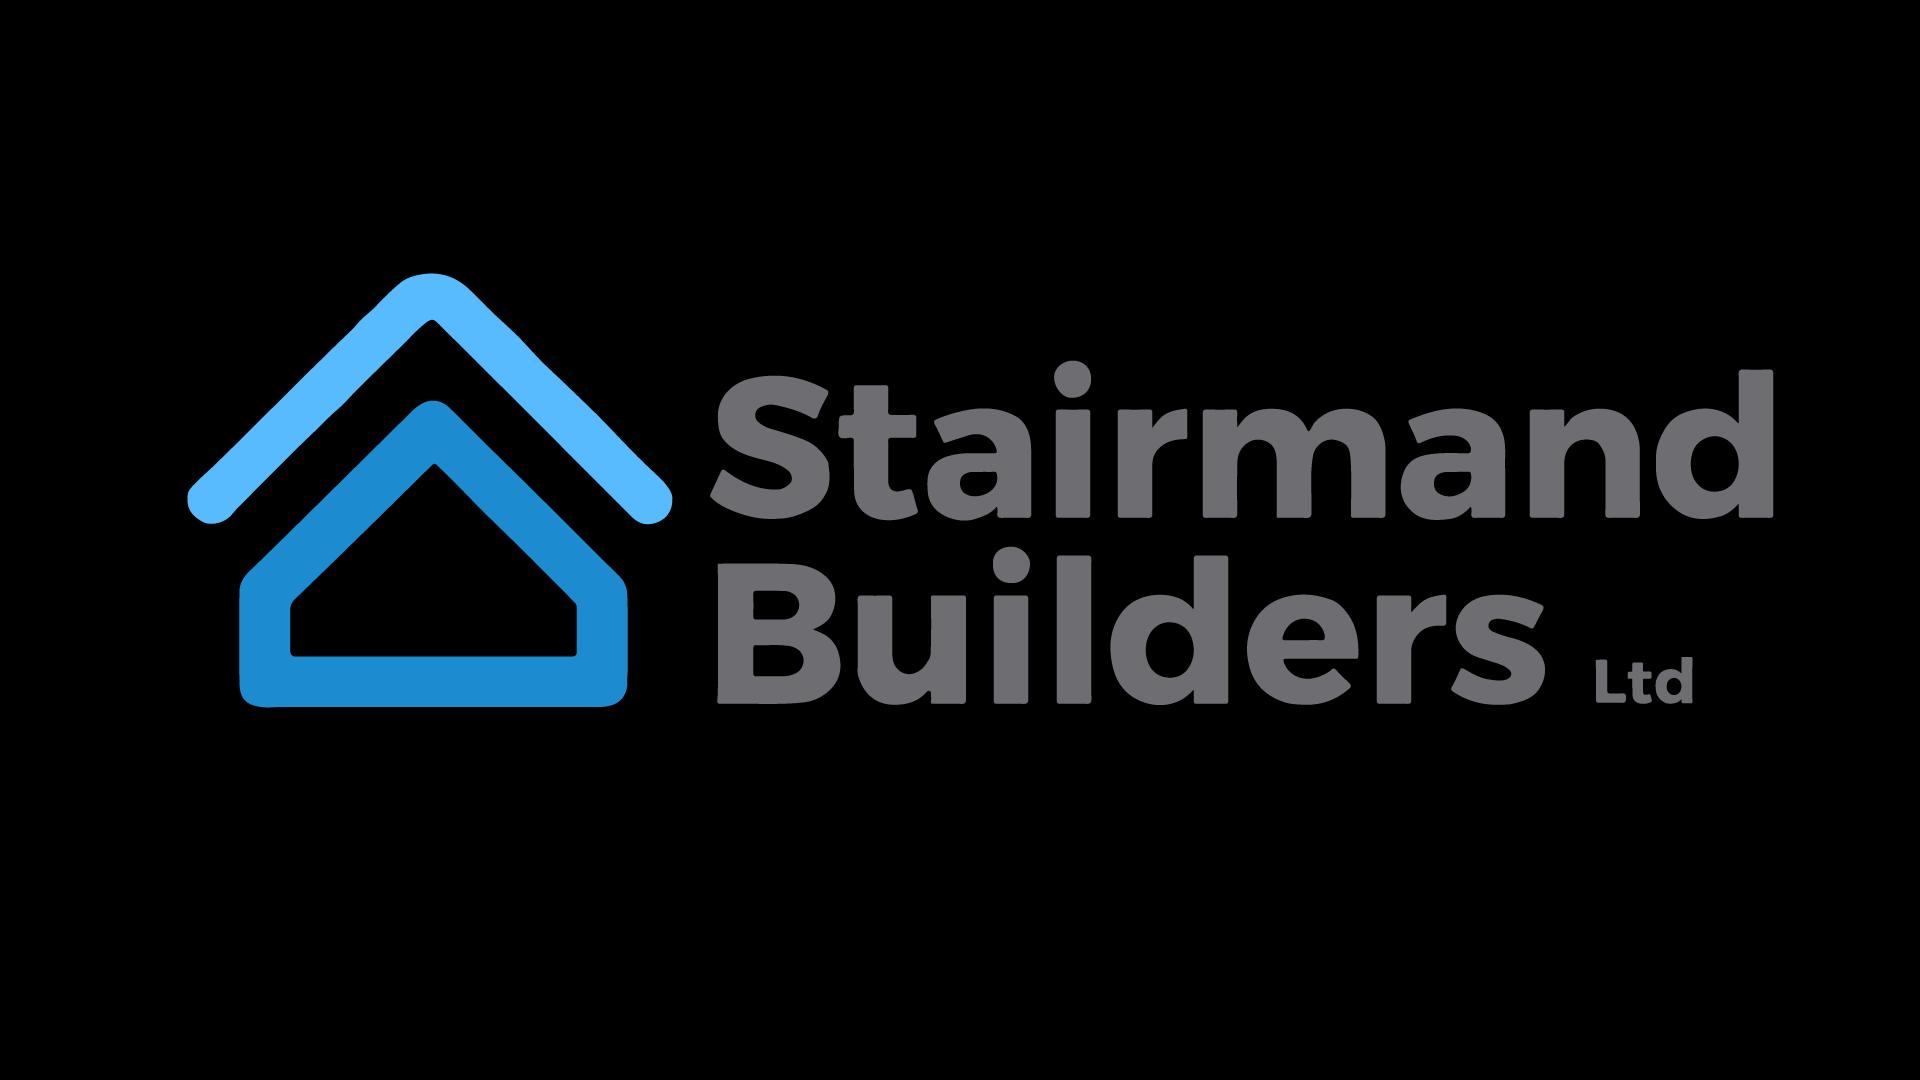 Stairmand Builders